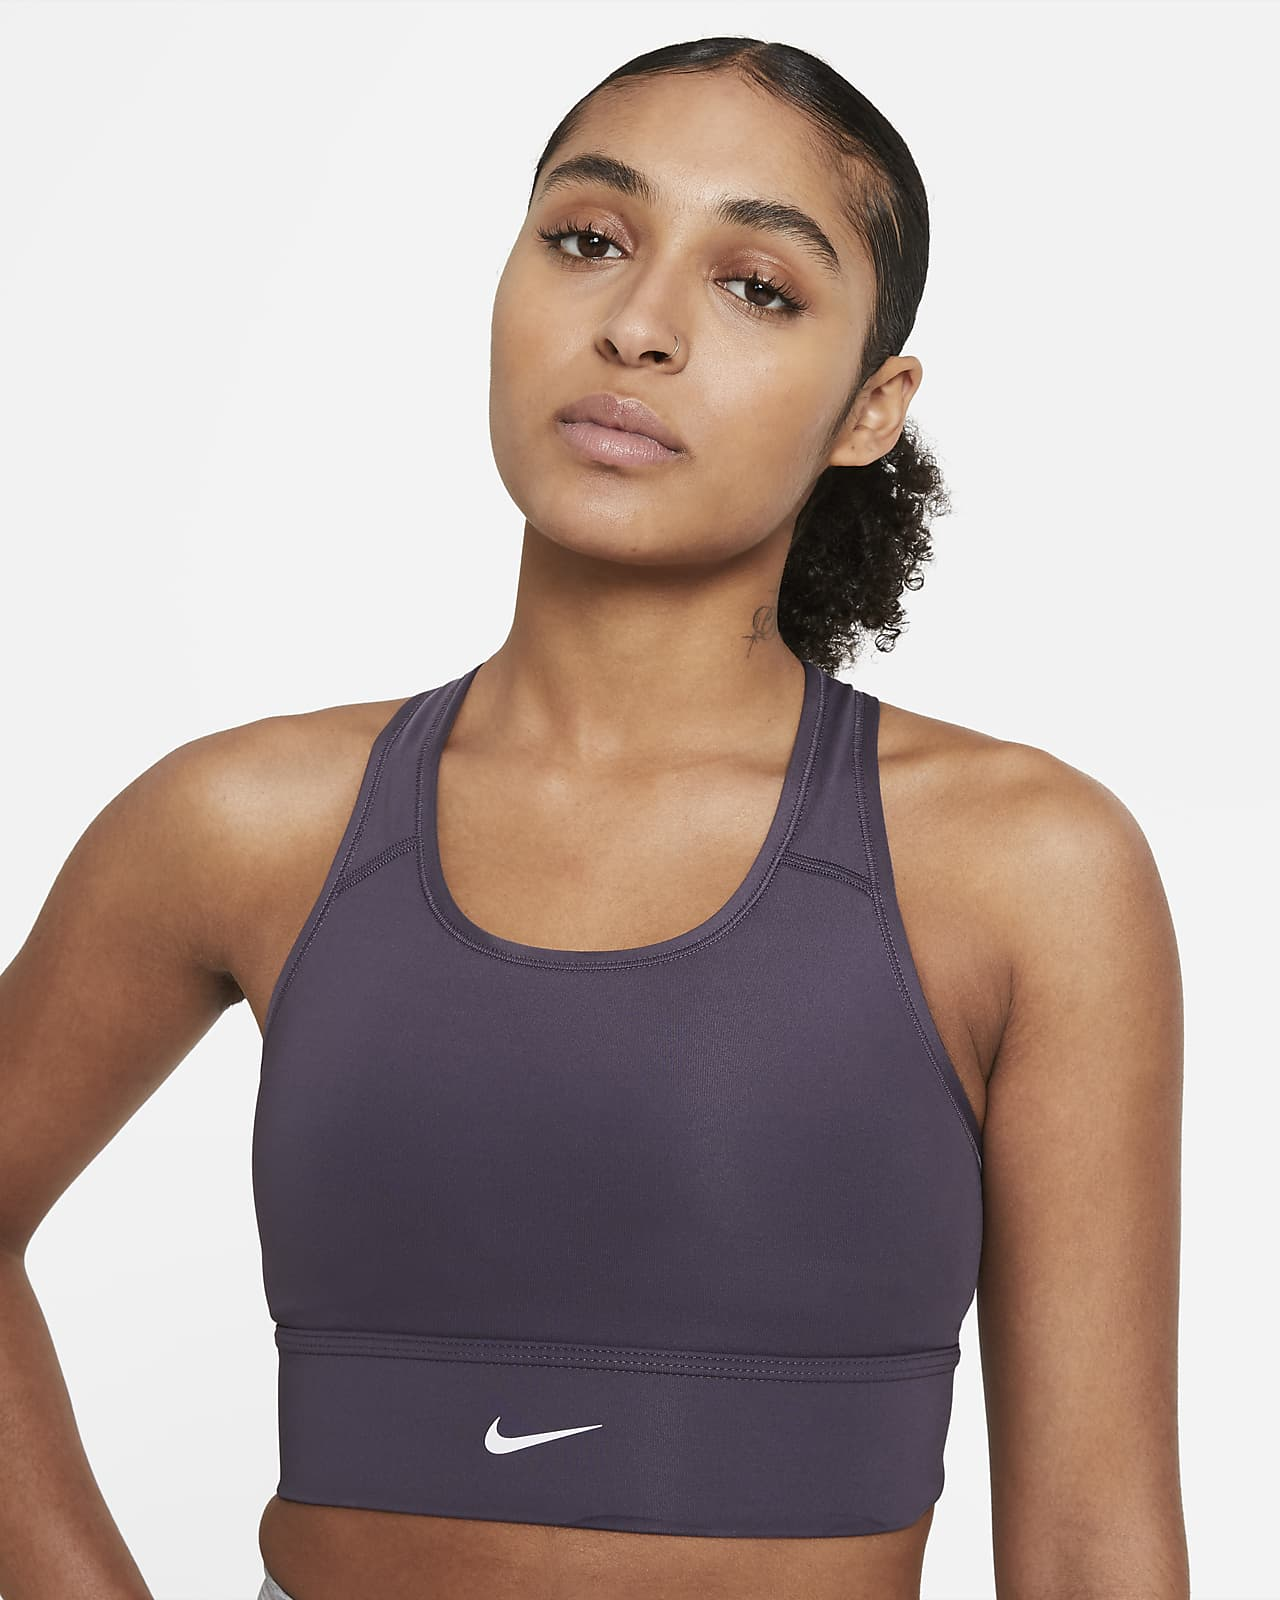 Nike Swoosh Women's Medium-Support Longline Sports Bra